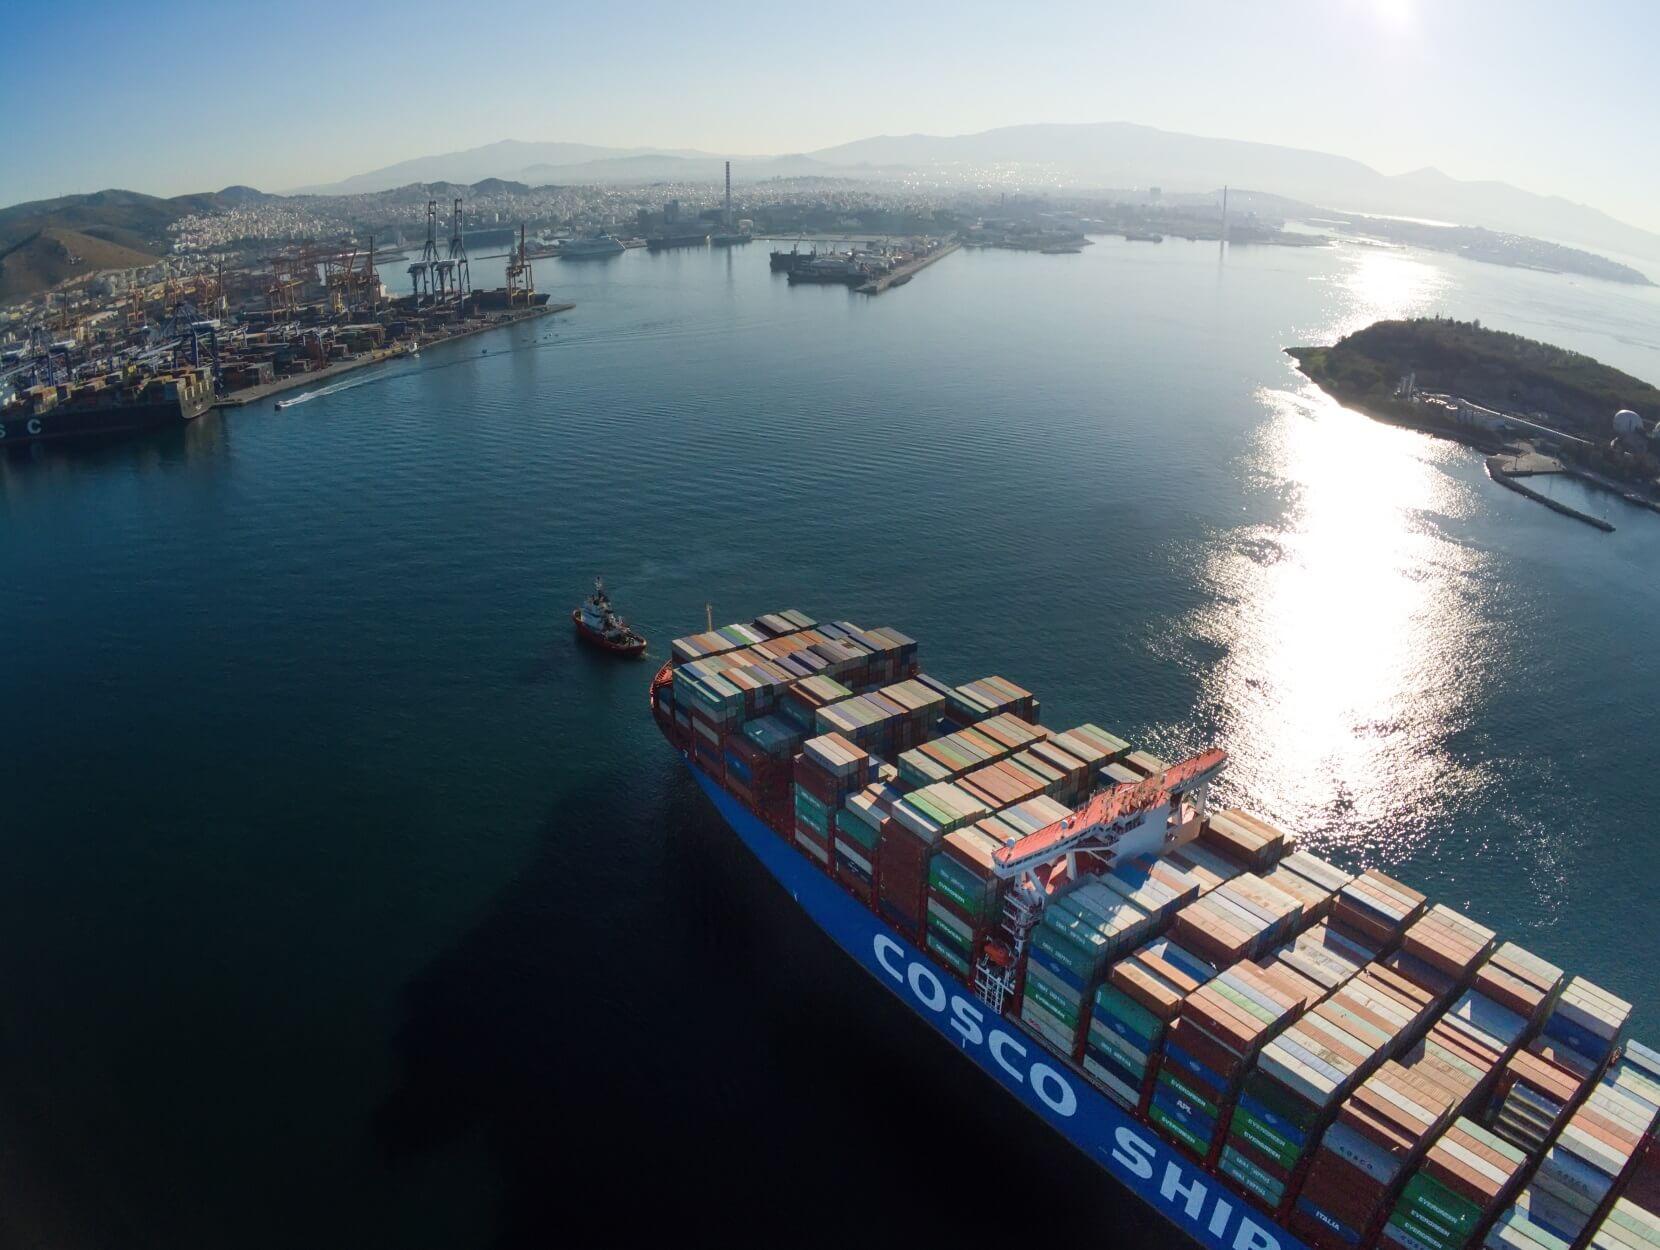 Frankfurter Rundschau: Πειραιάς, το κεφάλι του Κινέζικου δράκου στην Ευρώπη